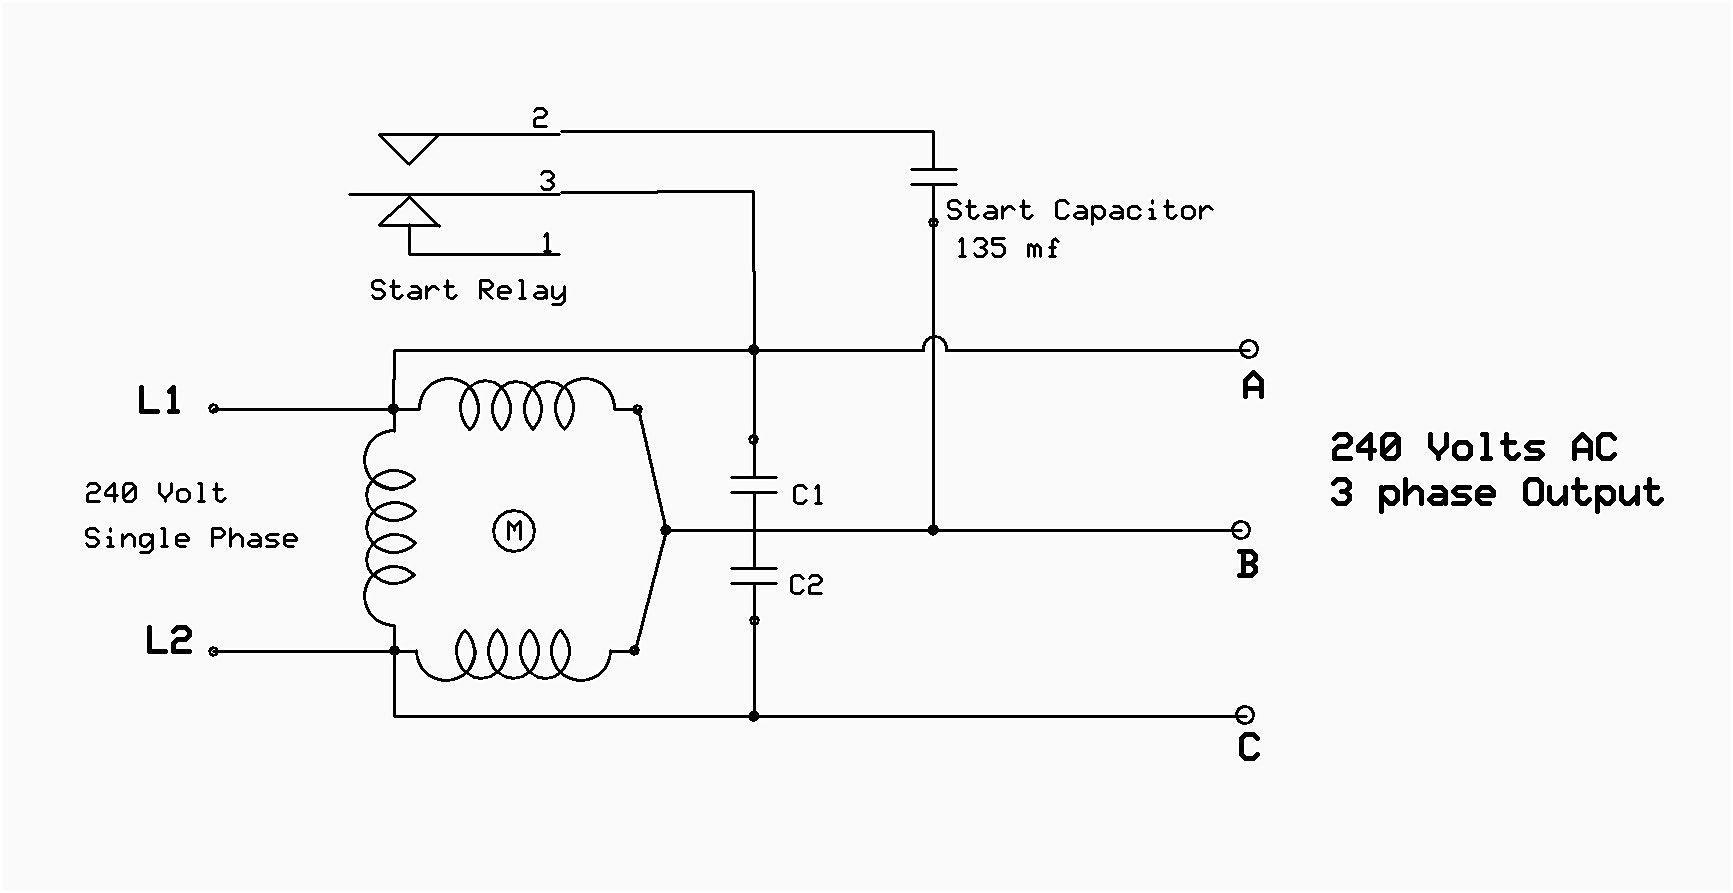 480v 3 Phase Motor Wiring Diagram Elegant In 2020 Electrical Diagram Diagram Capacitors